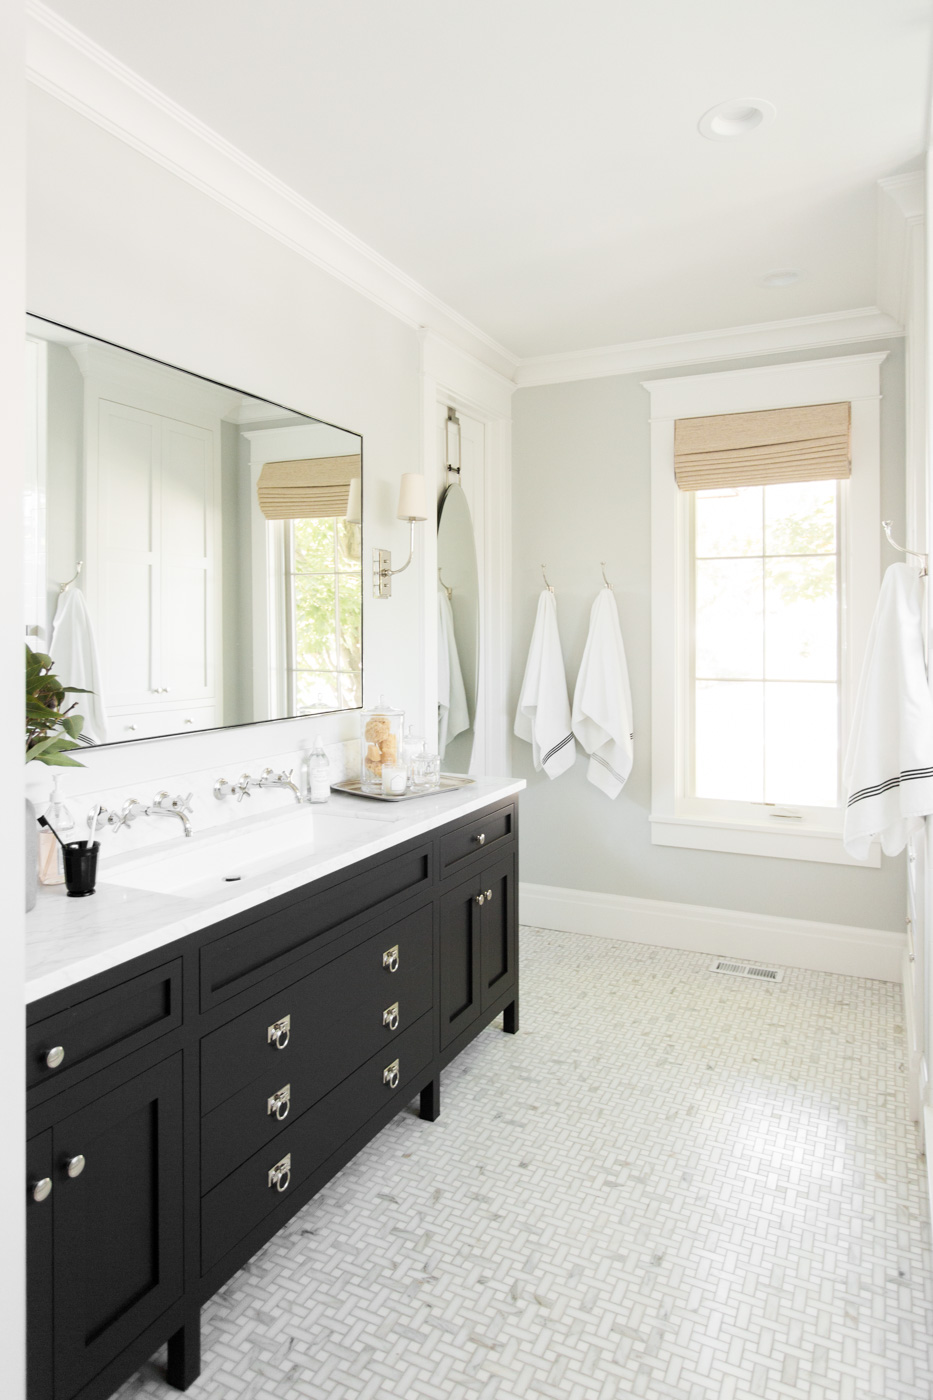 Black and white vanity in bathroom